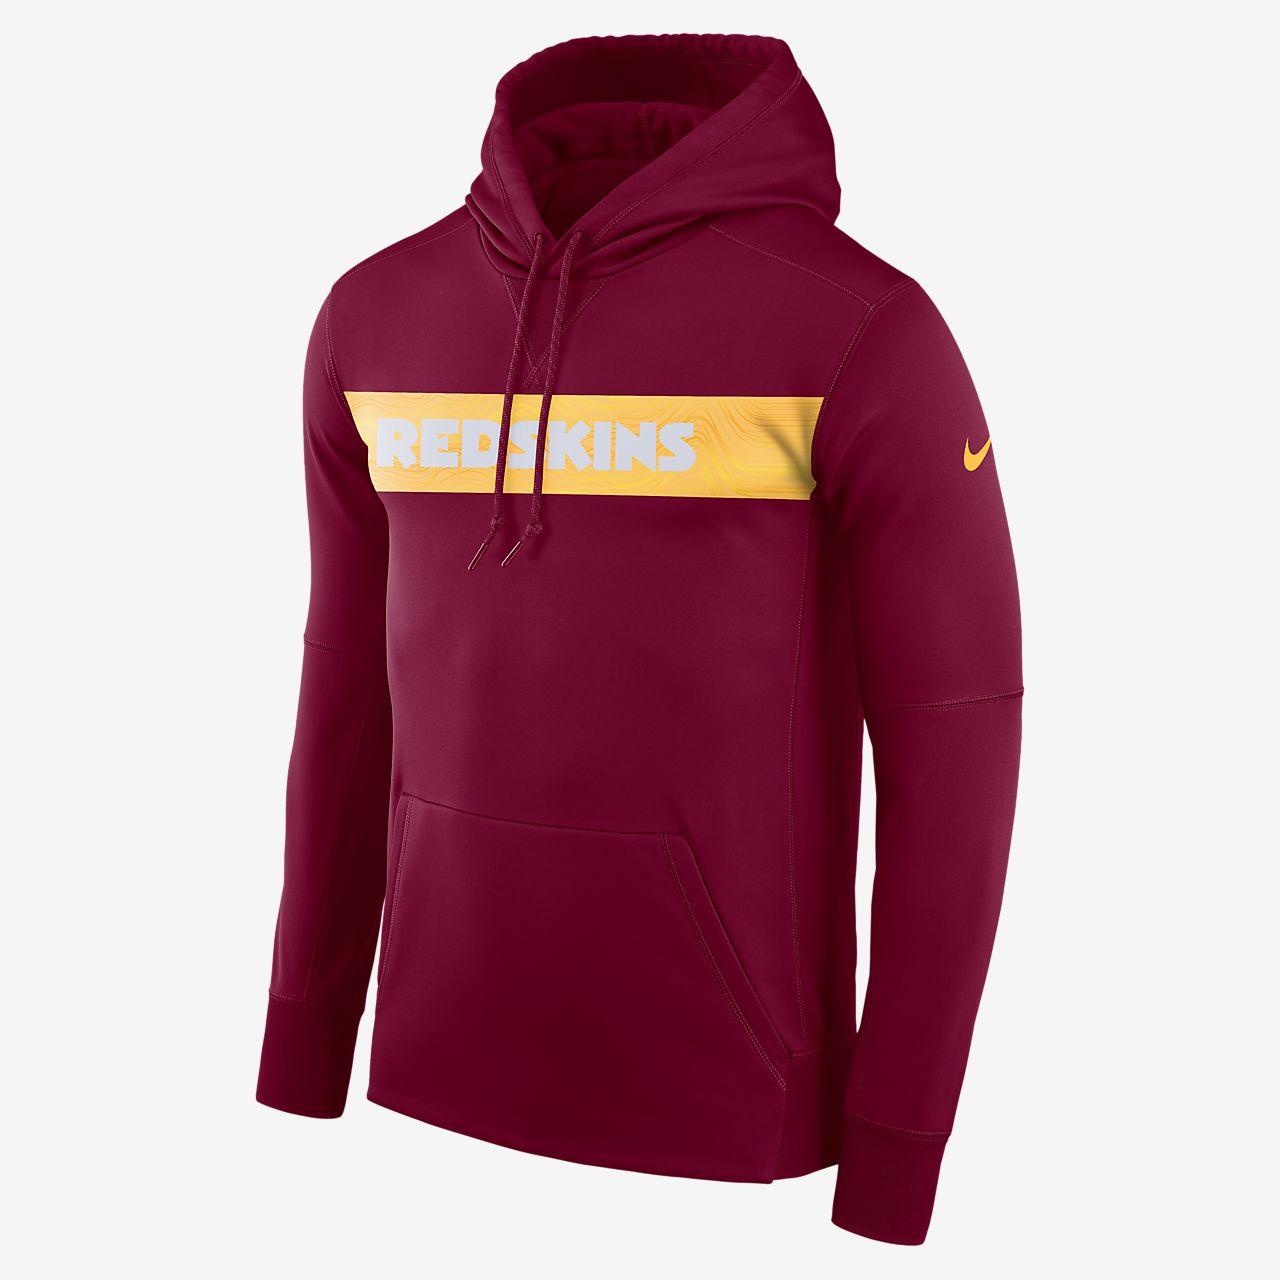 Nike Dri-FIT Therma (NFL Redskins) Pullover-Hoodie für Herren